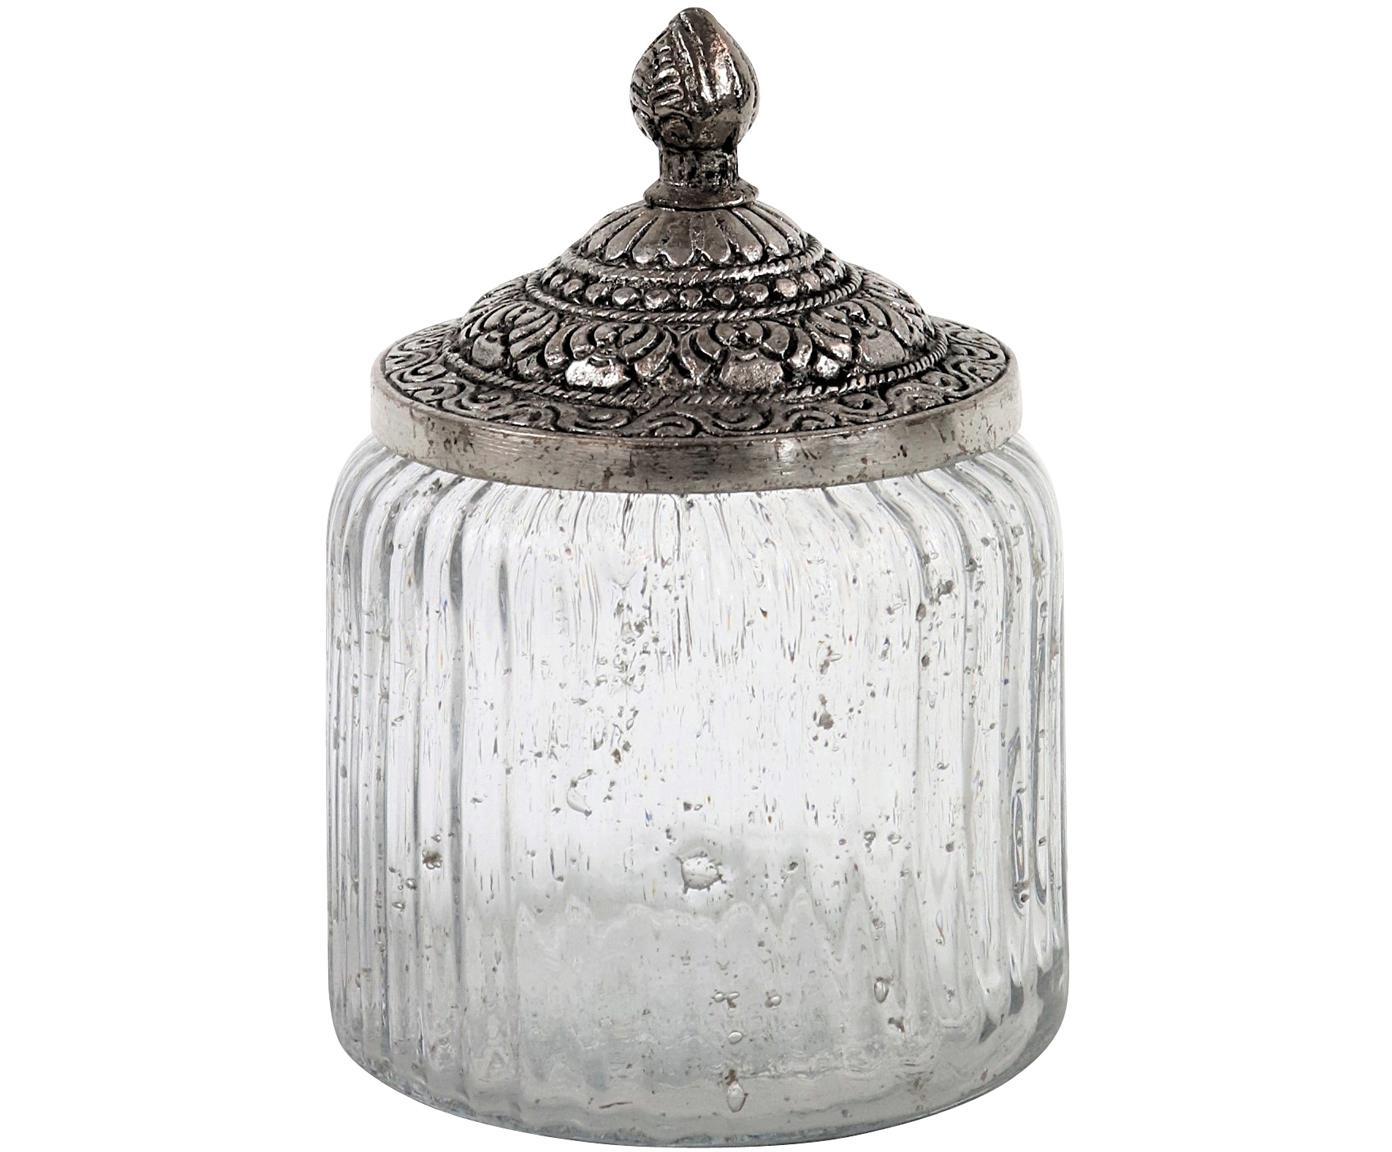 Opbergpot Alhambra , Pot: glas, Deksel: metaal, Transparant, zilverkleurig, Ø 10 x H 15 cm